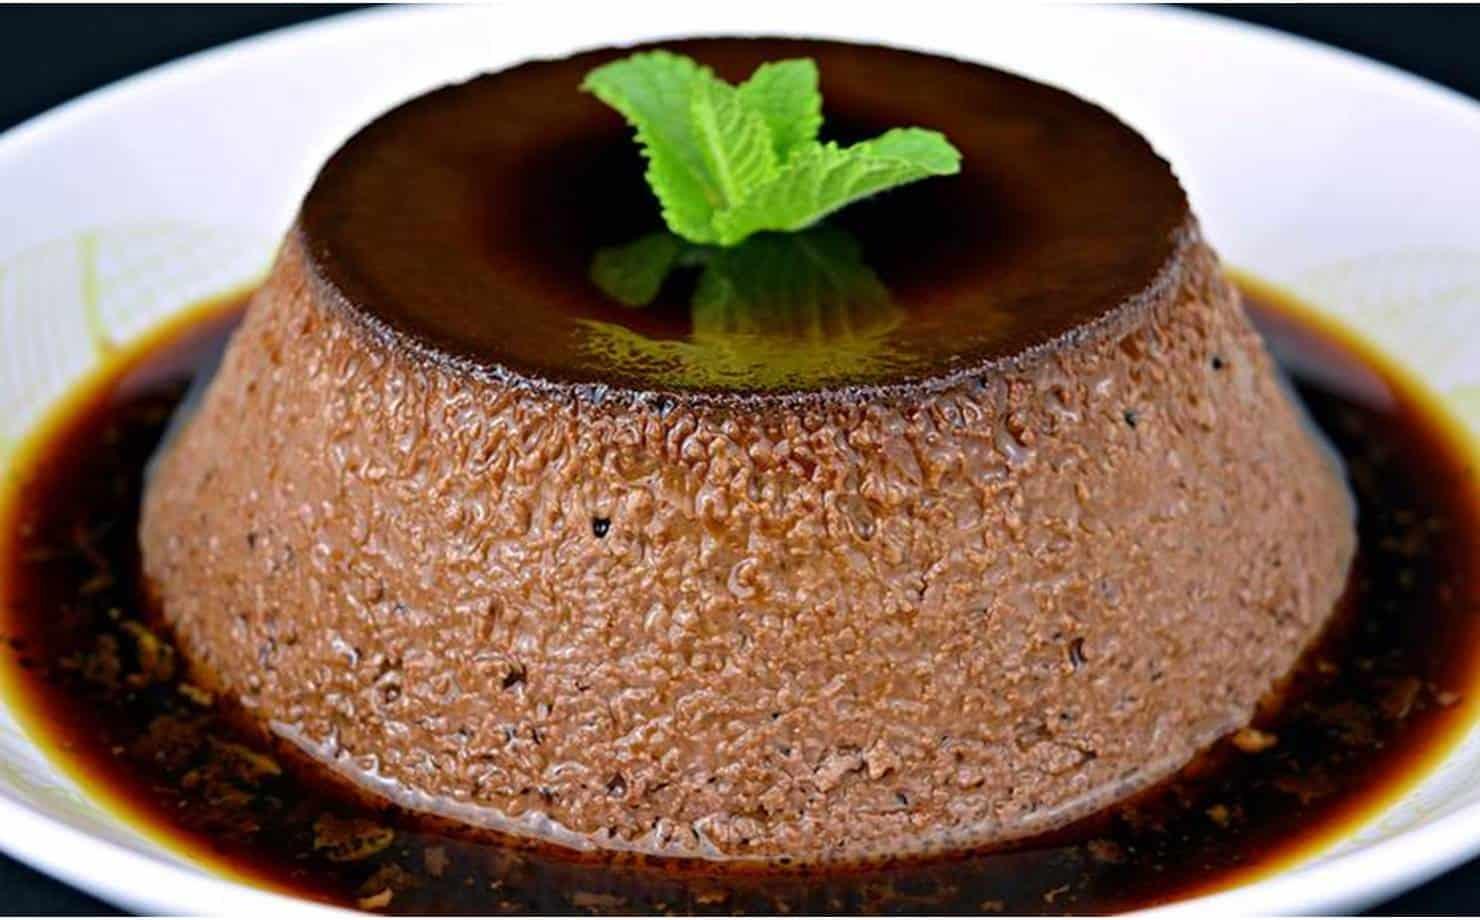 Prepare um saboroso pudim de chocolate sem forno